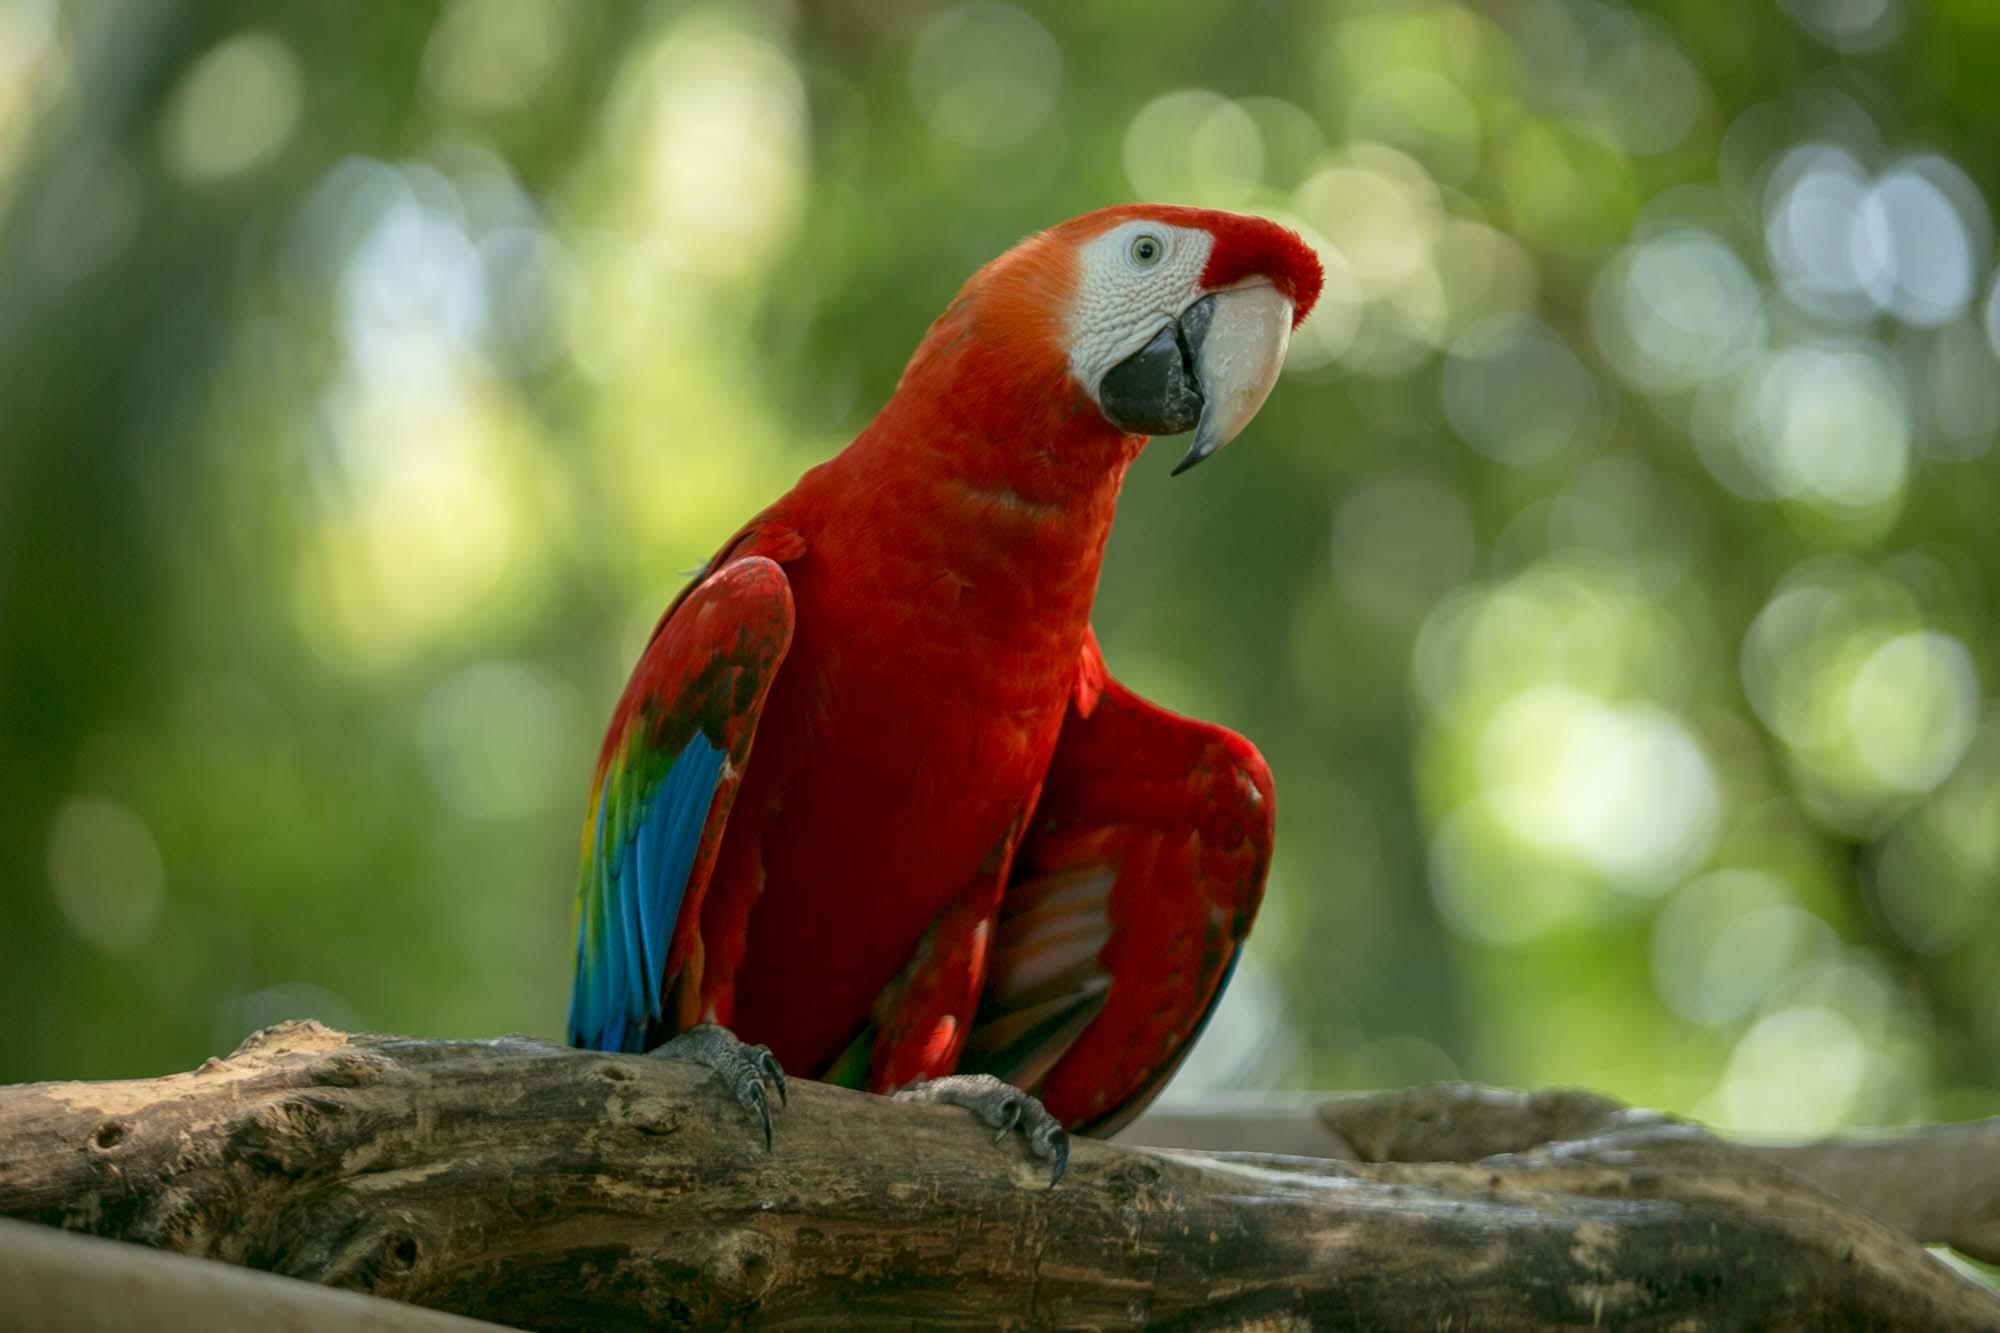 Scarlet macaw at Cartagena cruise port